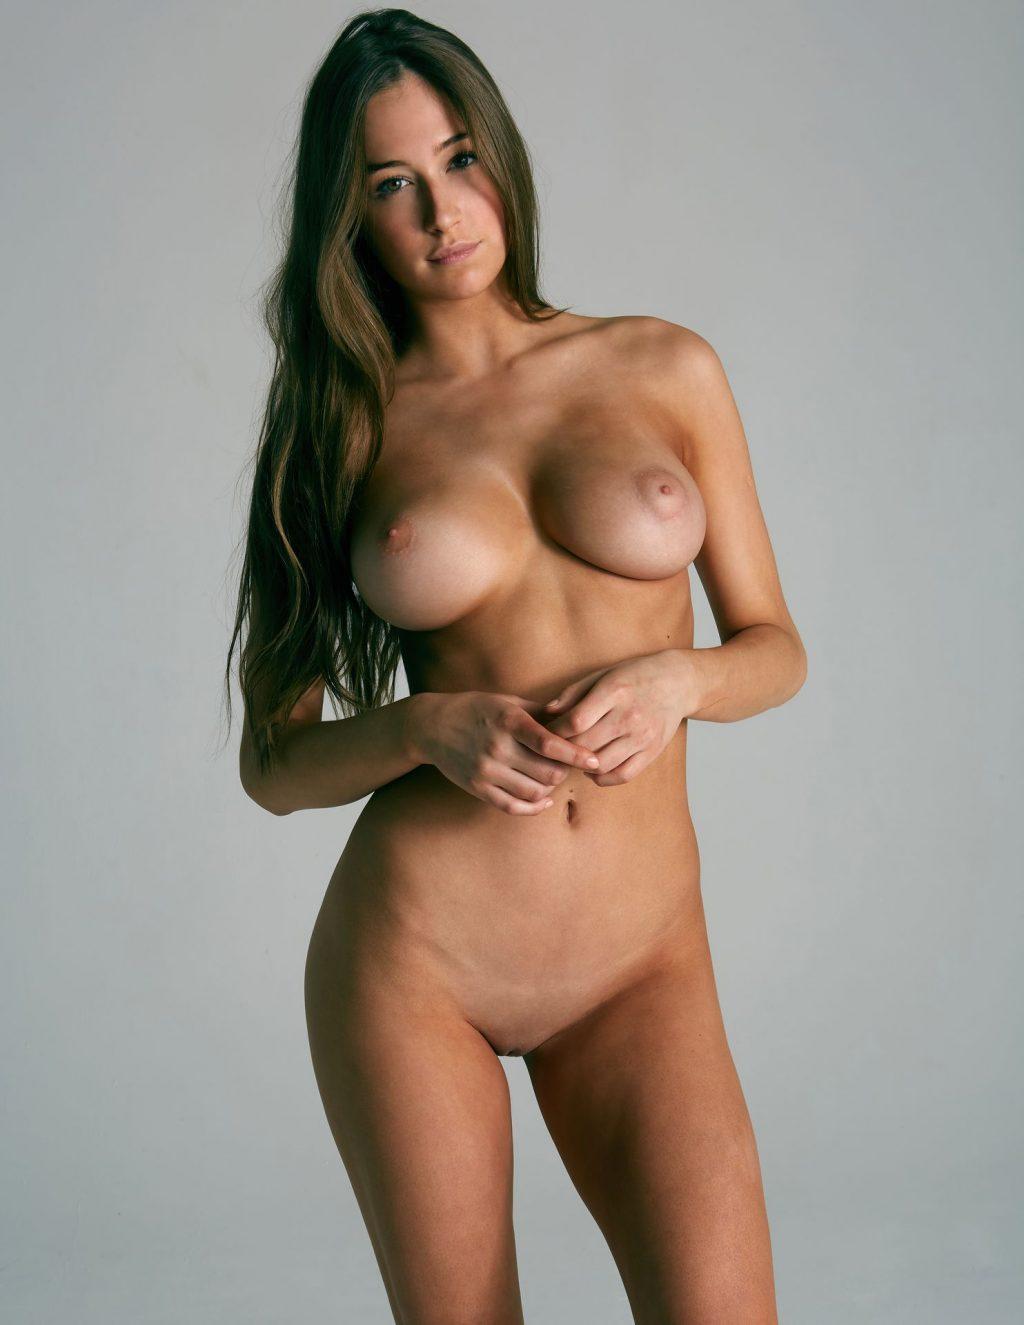 Elsie Hewitt Nude